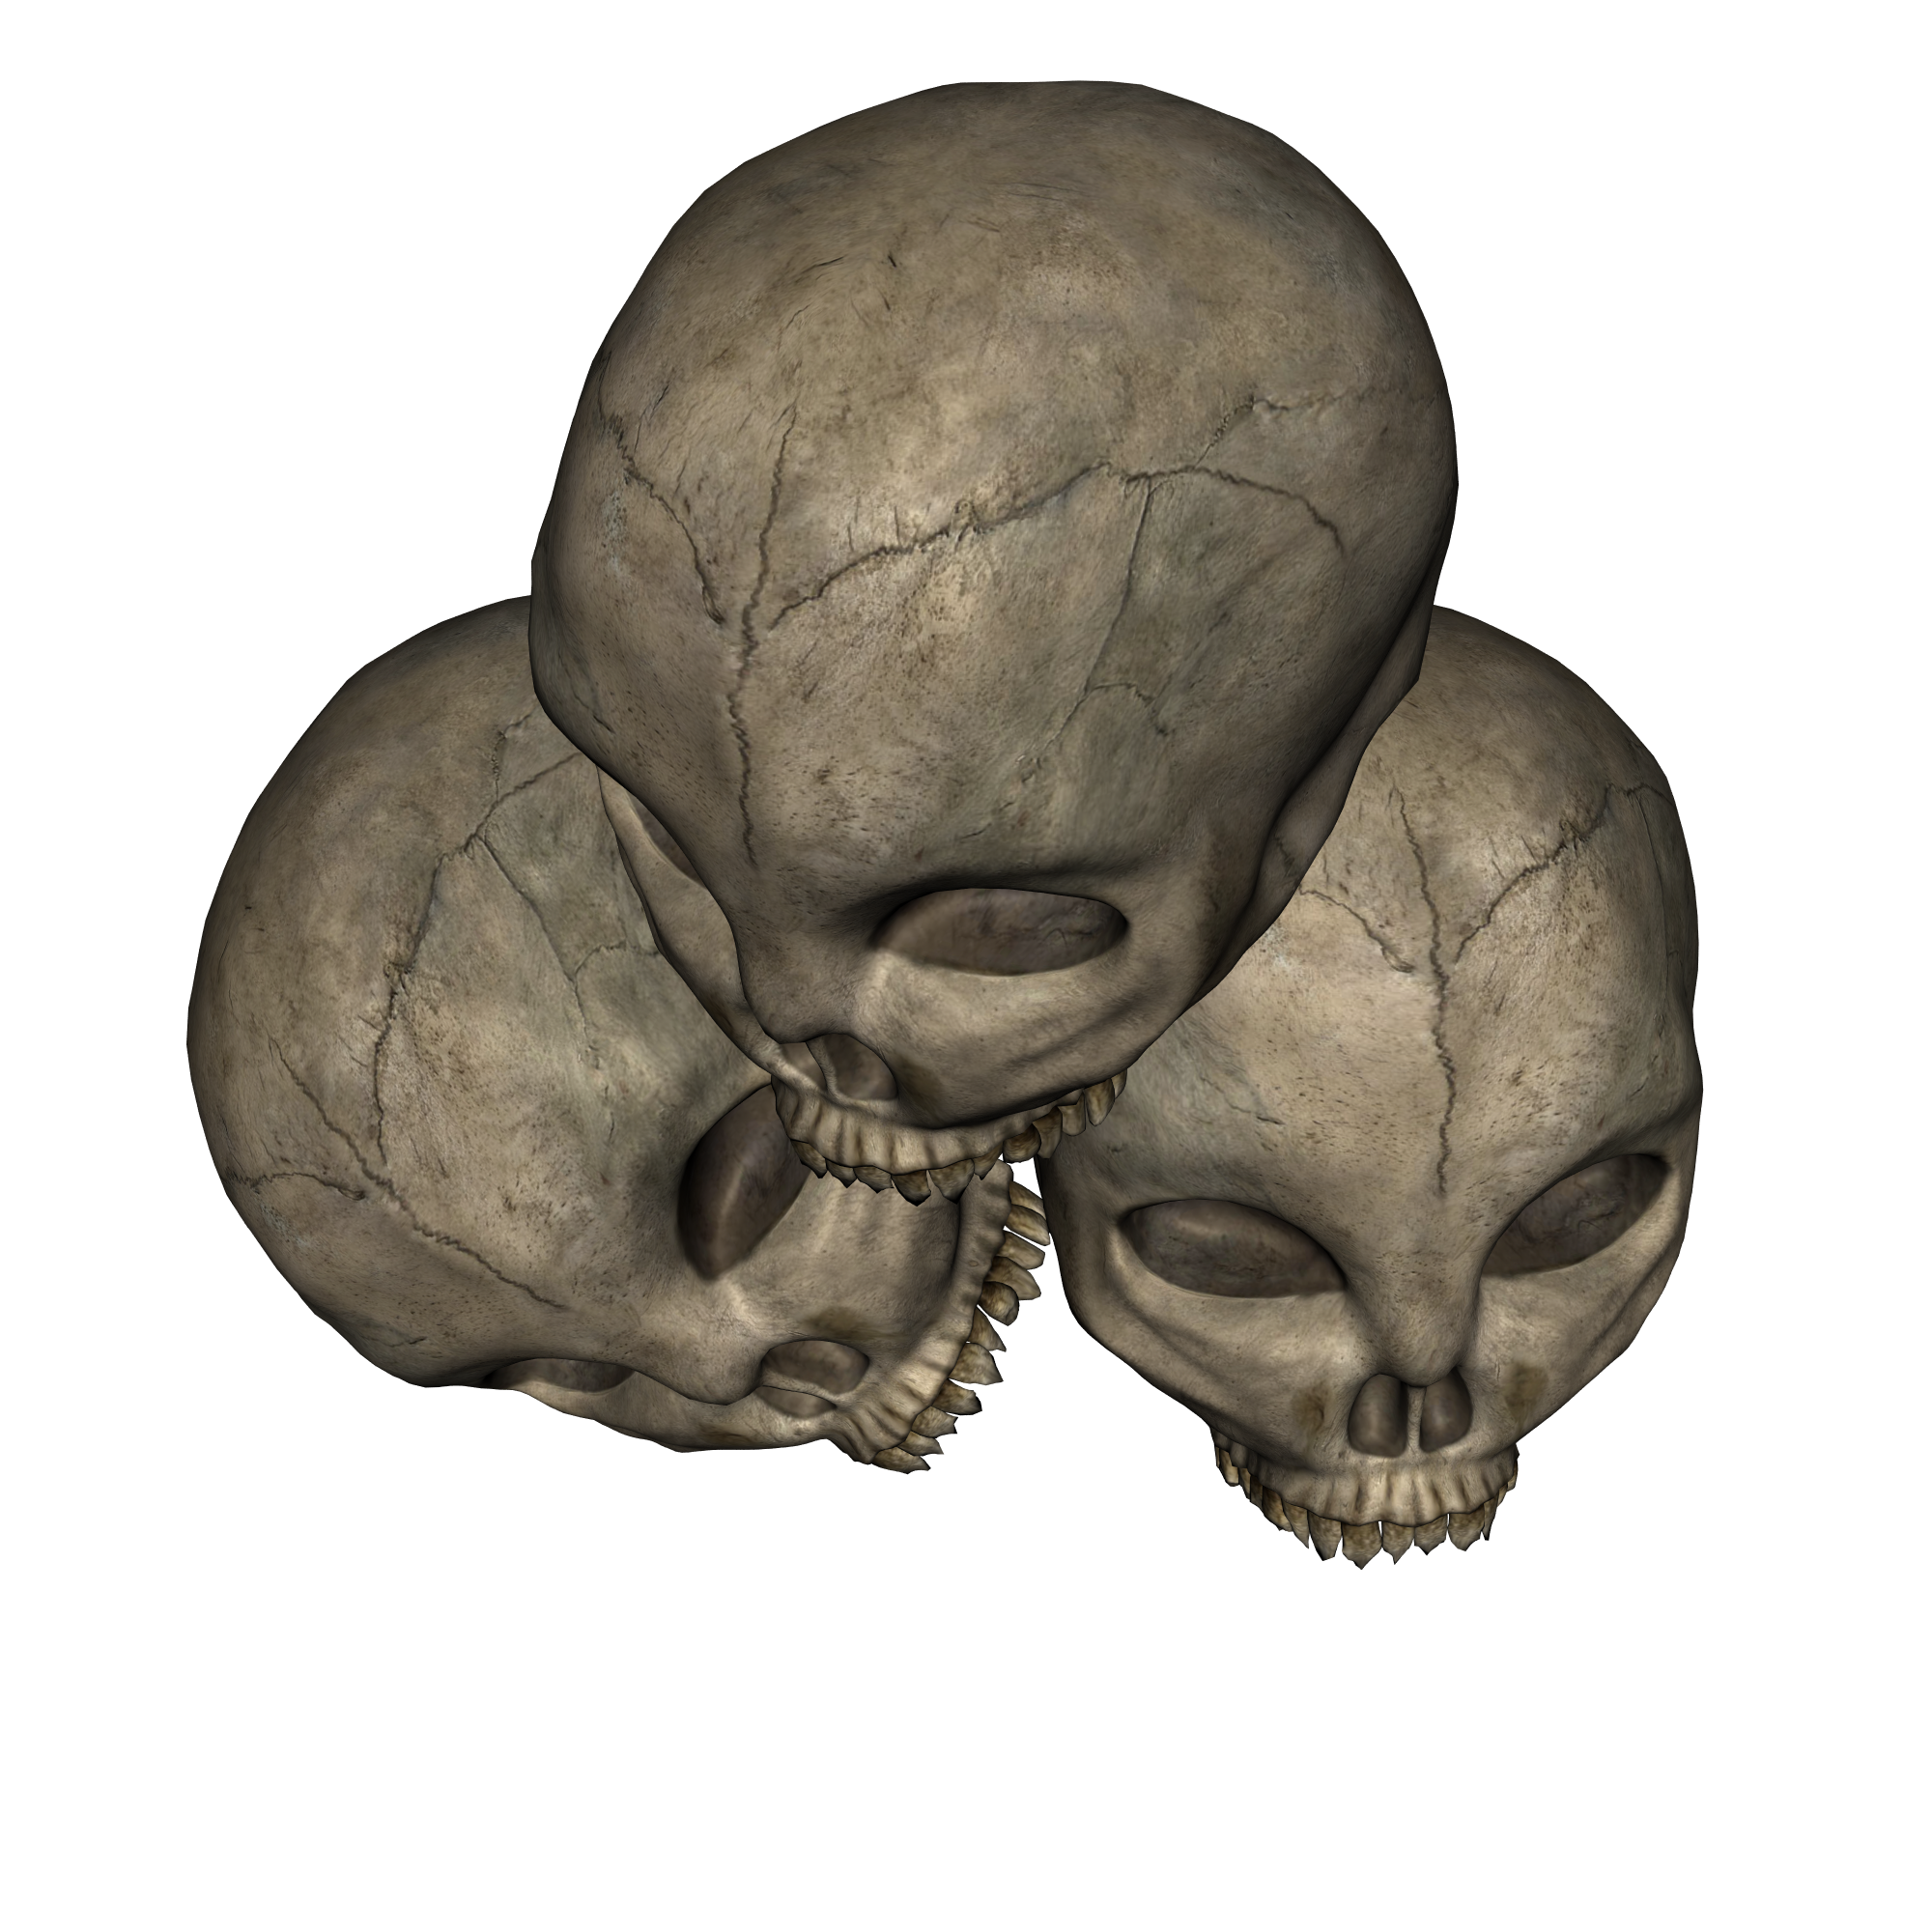 Skull Pile Top Side View Skull Miniature Gaming Sculpture